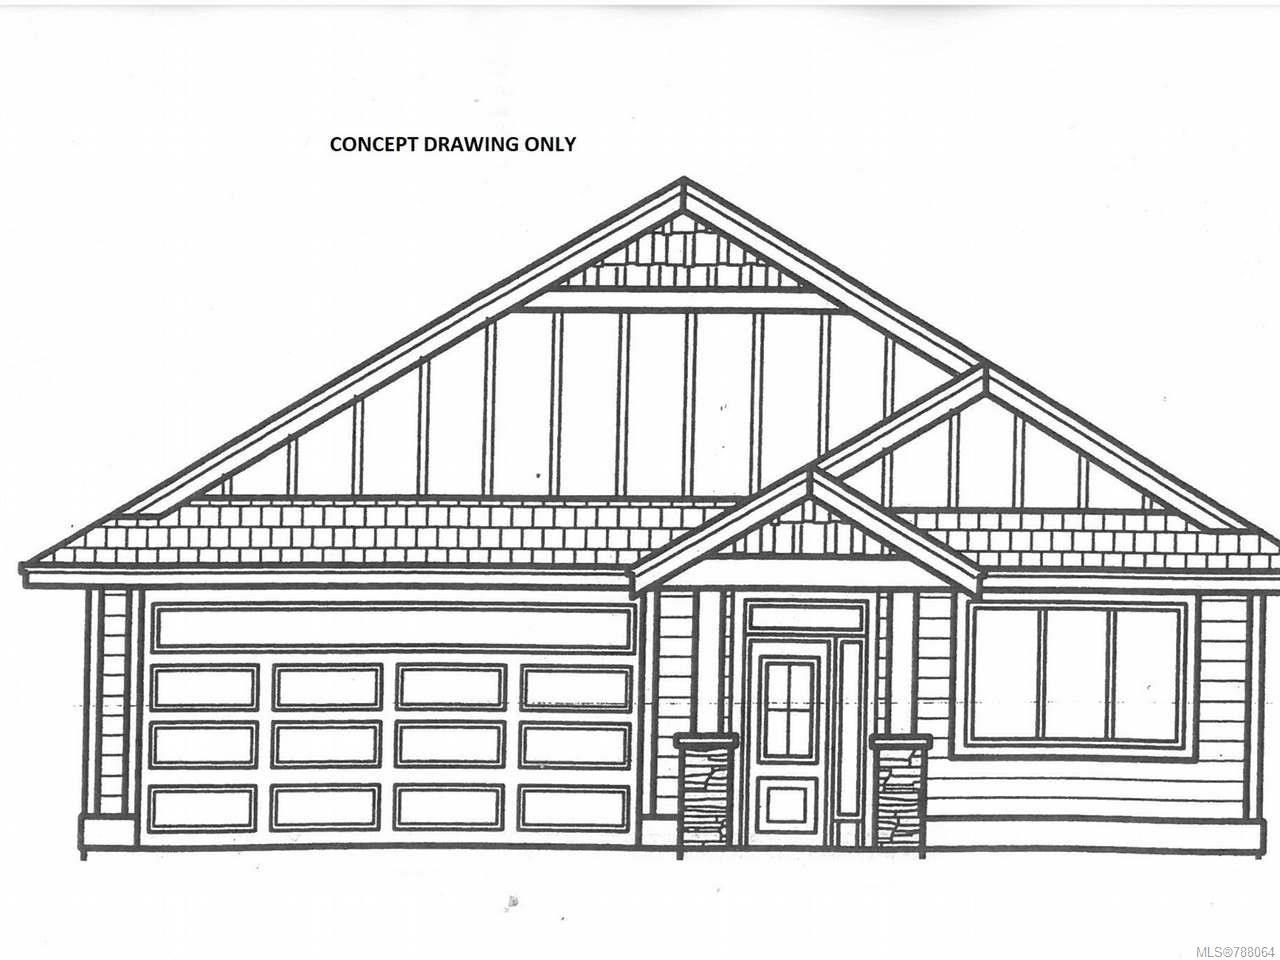 Main Photo: 4167 CHANCELLOR Crescent in COURTENAY: CV Courtenay City House for sale (Comox Valley)  : MLS®# 788064